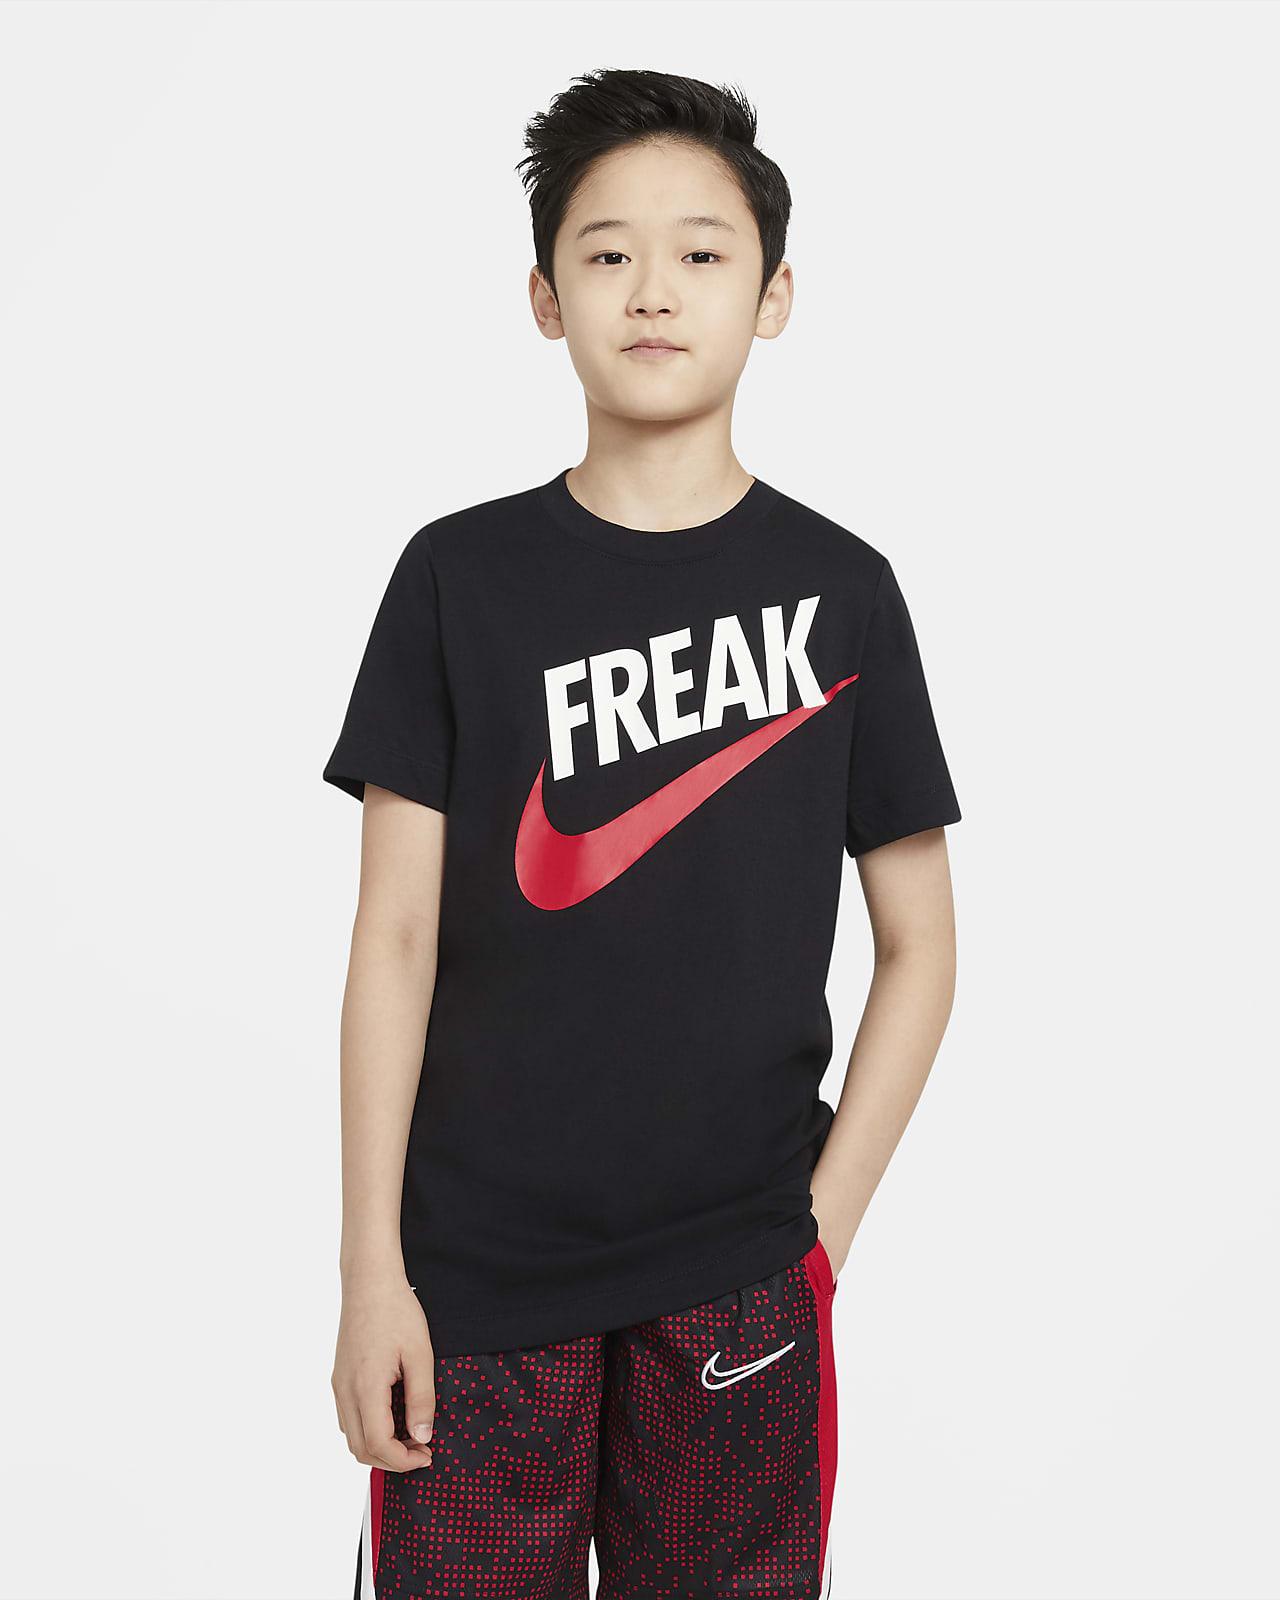 Футболка для мальчиков школьного возраста Nike Dri-FIT Giannis